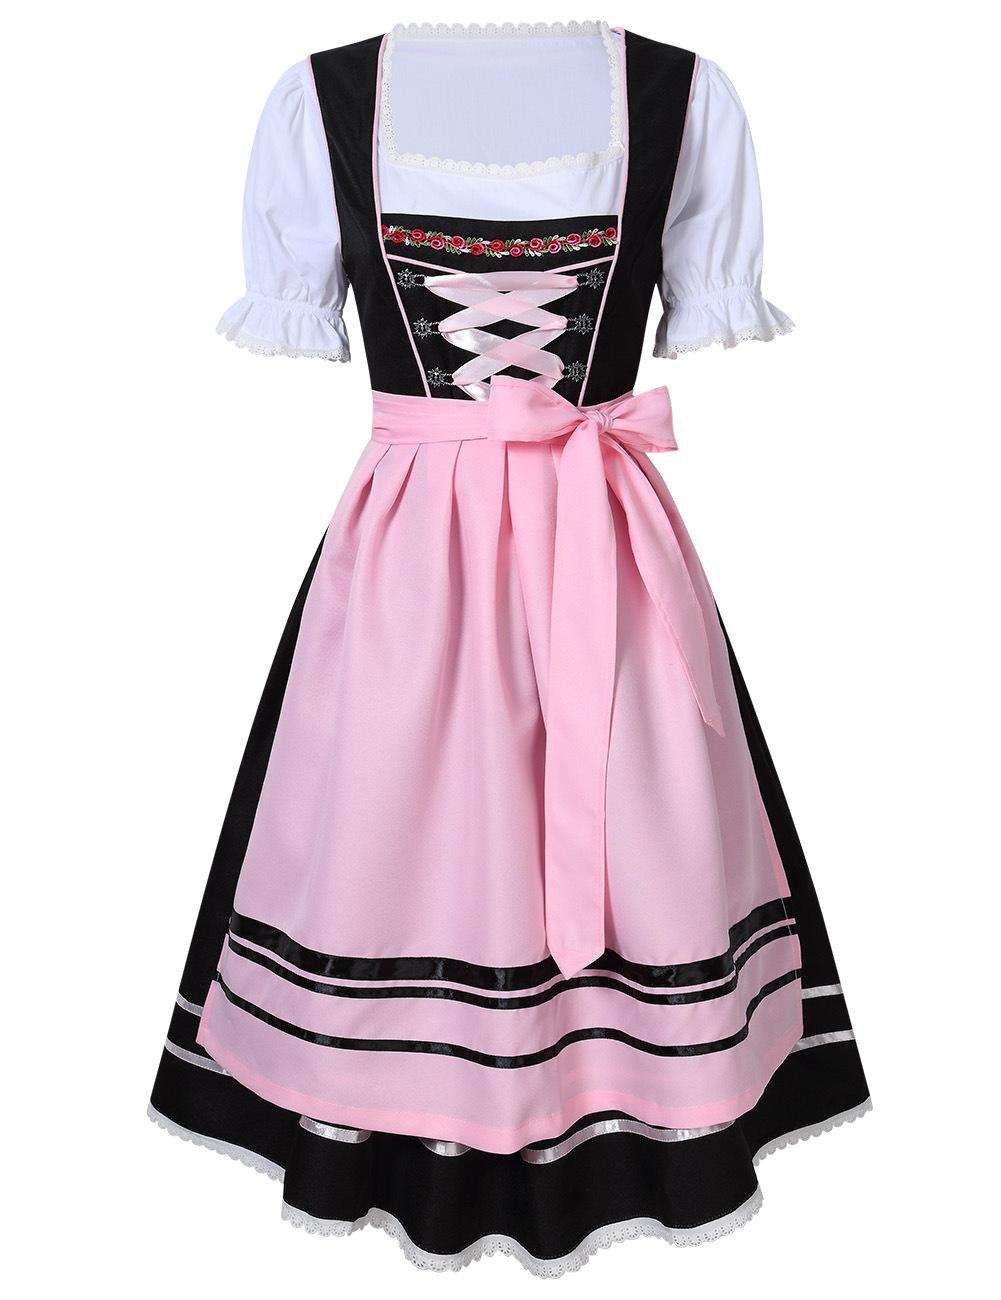 Female Bavarian Traditional Dirndl Dress Fastening Ties for Beer Festival  Pink/black_S